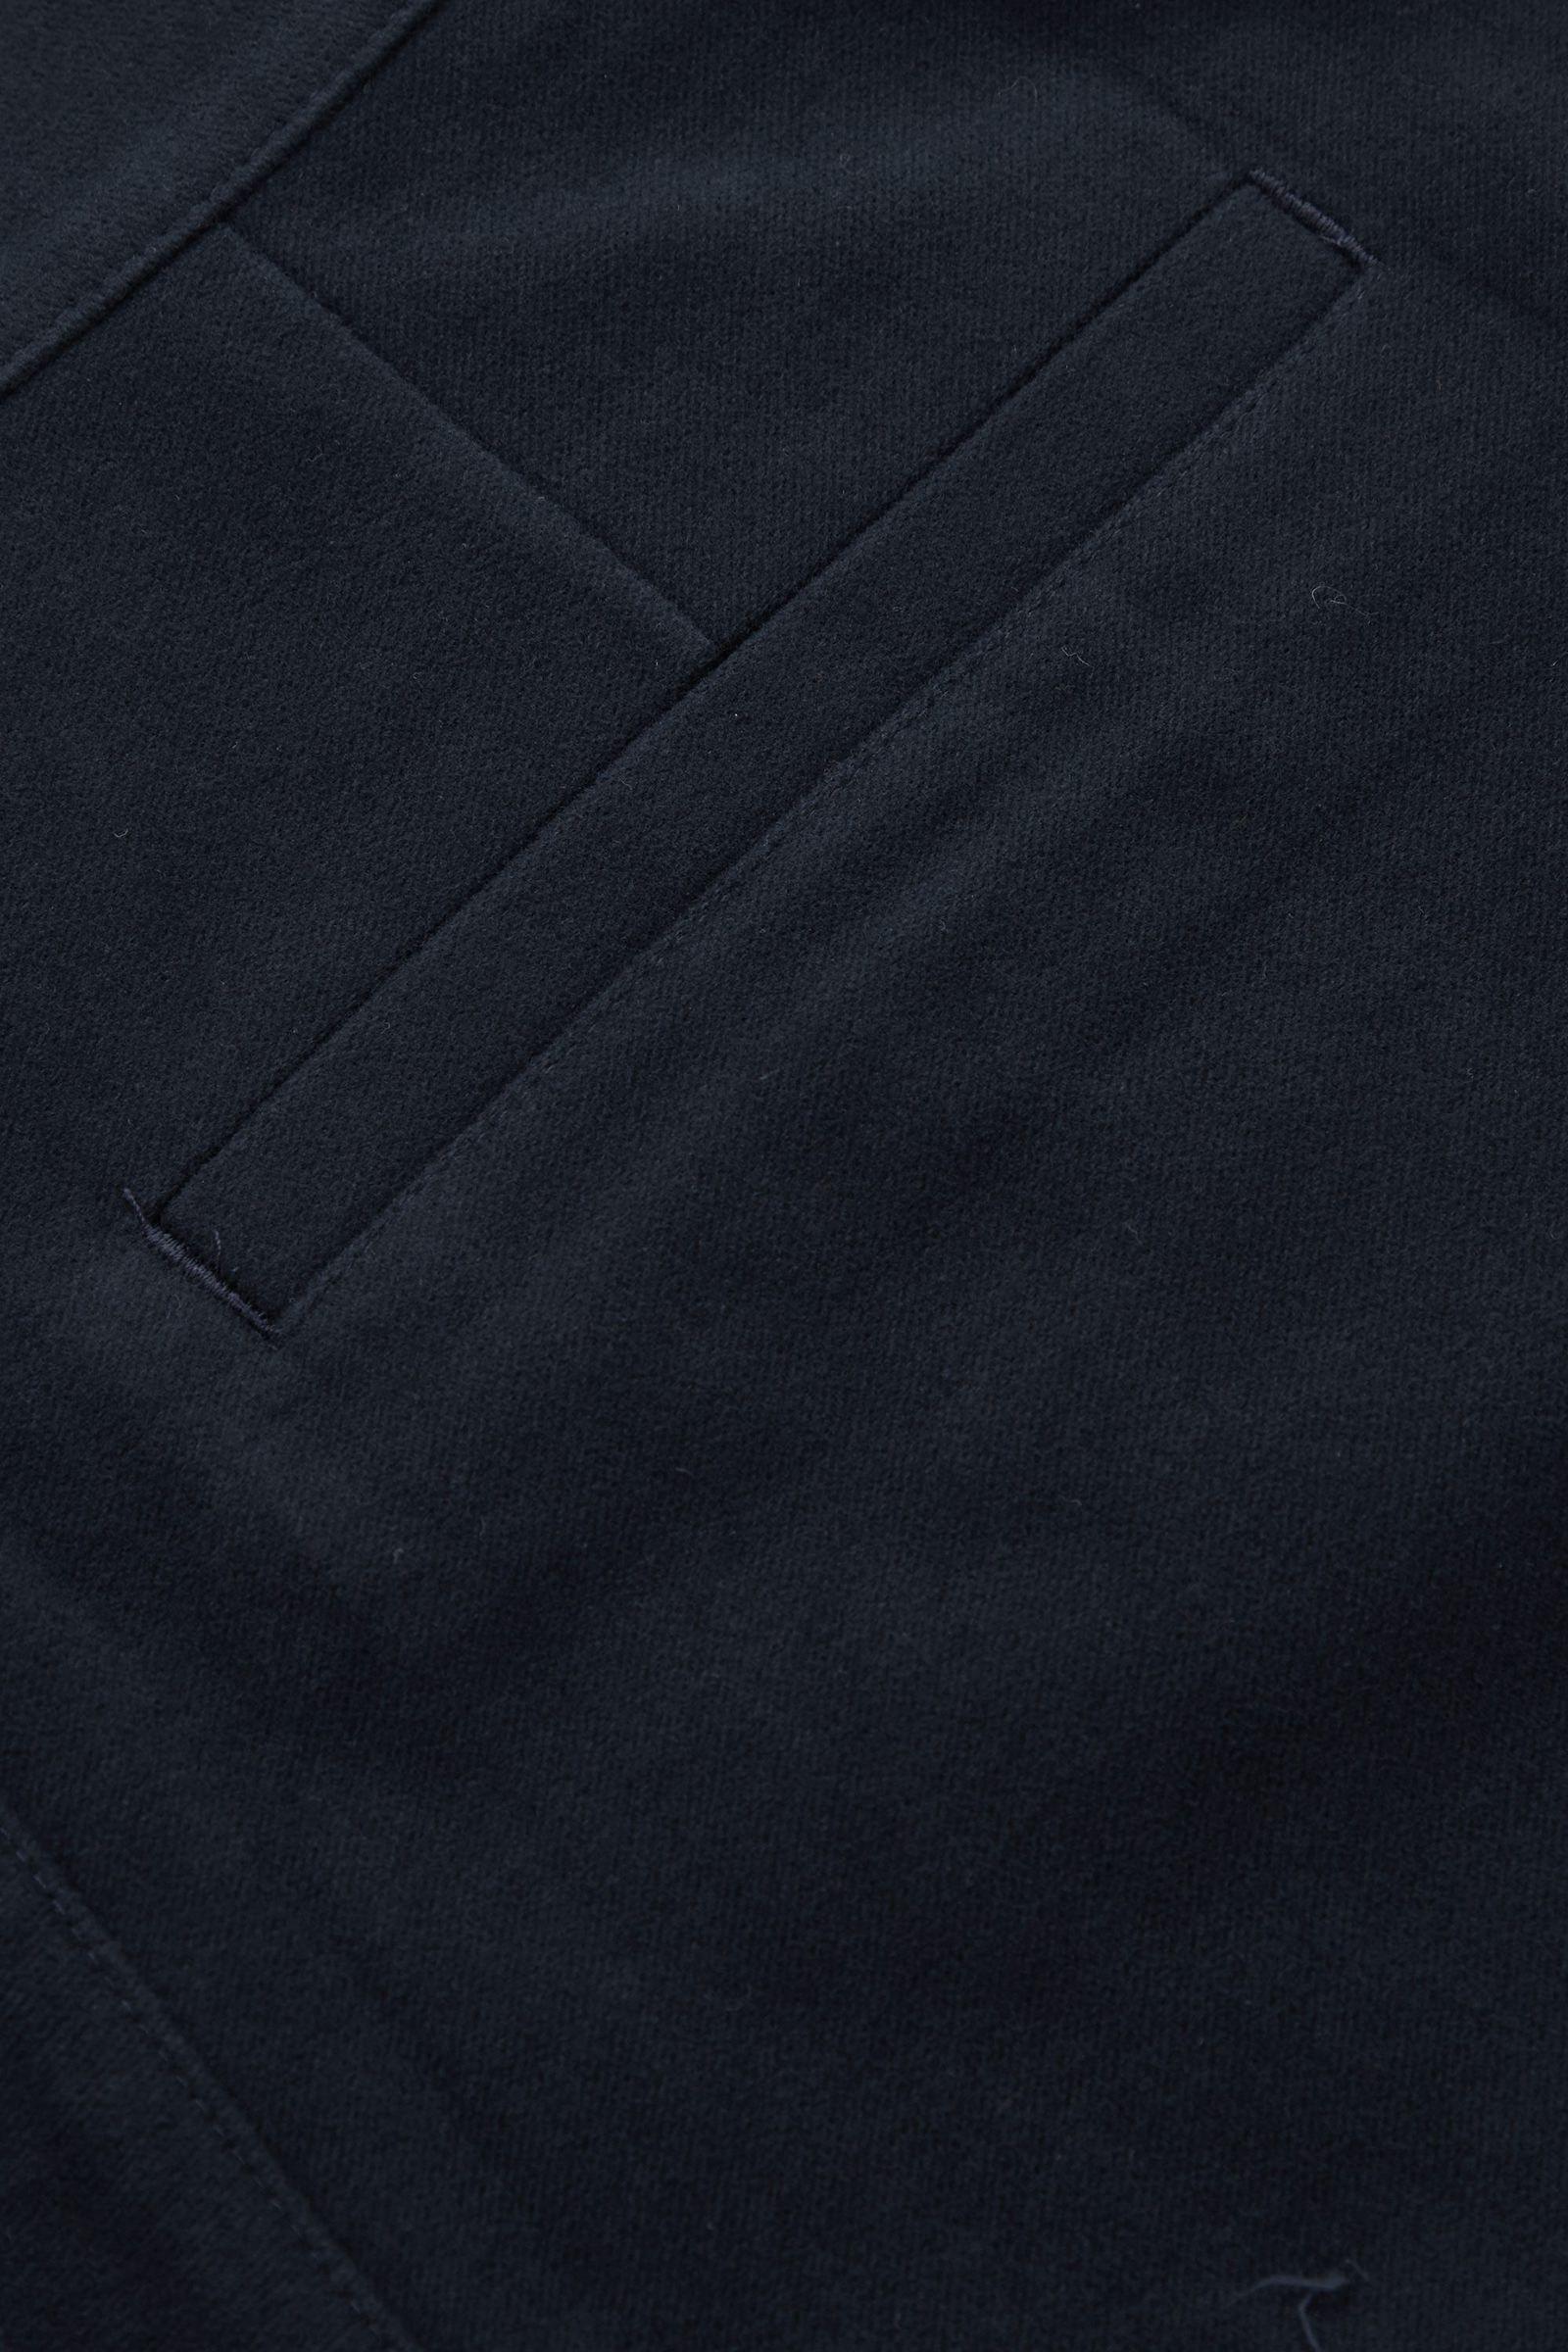 COS 코튼 테이퍼드 레그 플리츠 치노 트라우저의 네이비컬러 Detail입니다.